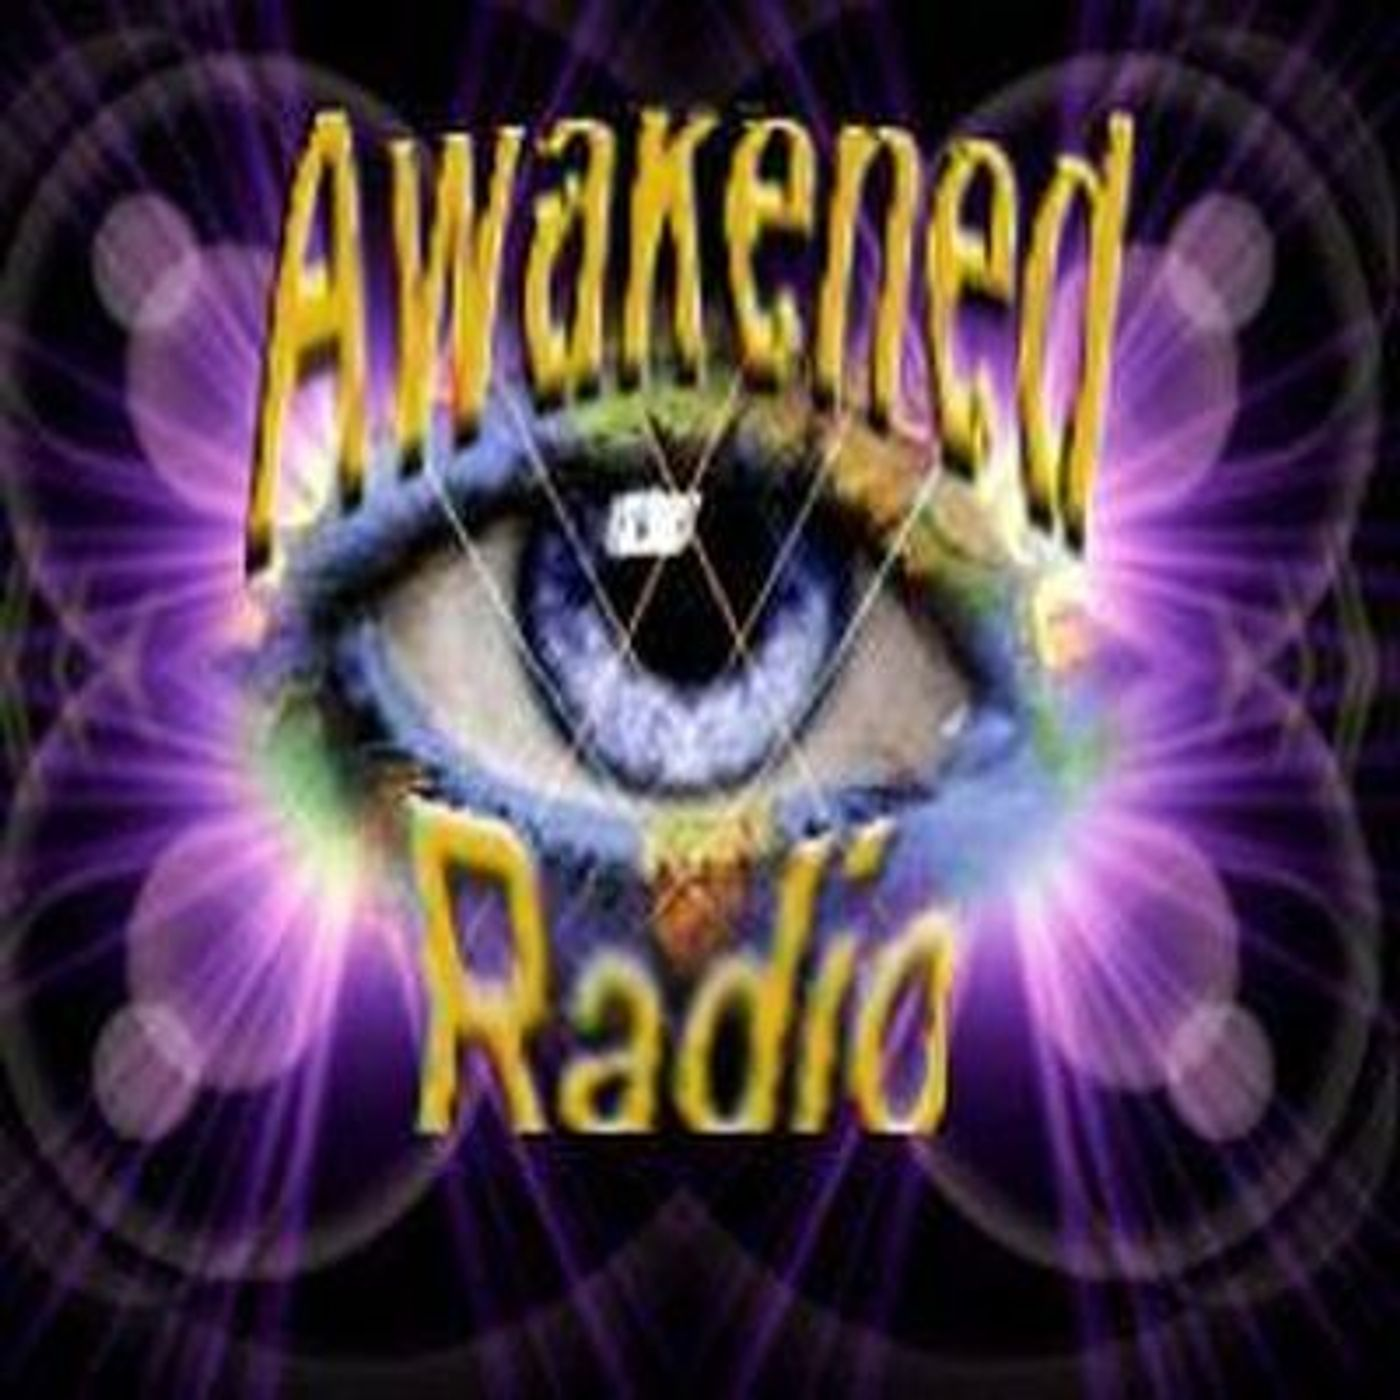 Awakened Radio Live